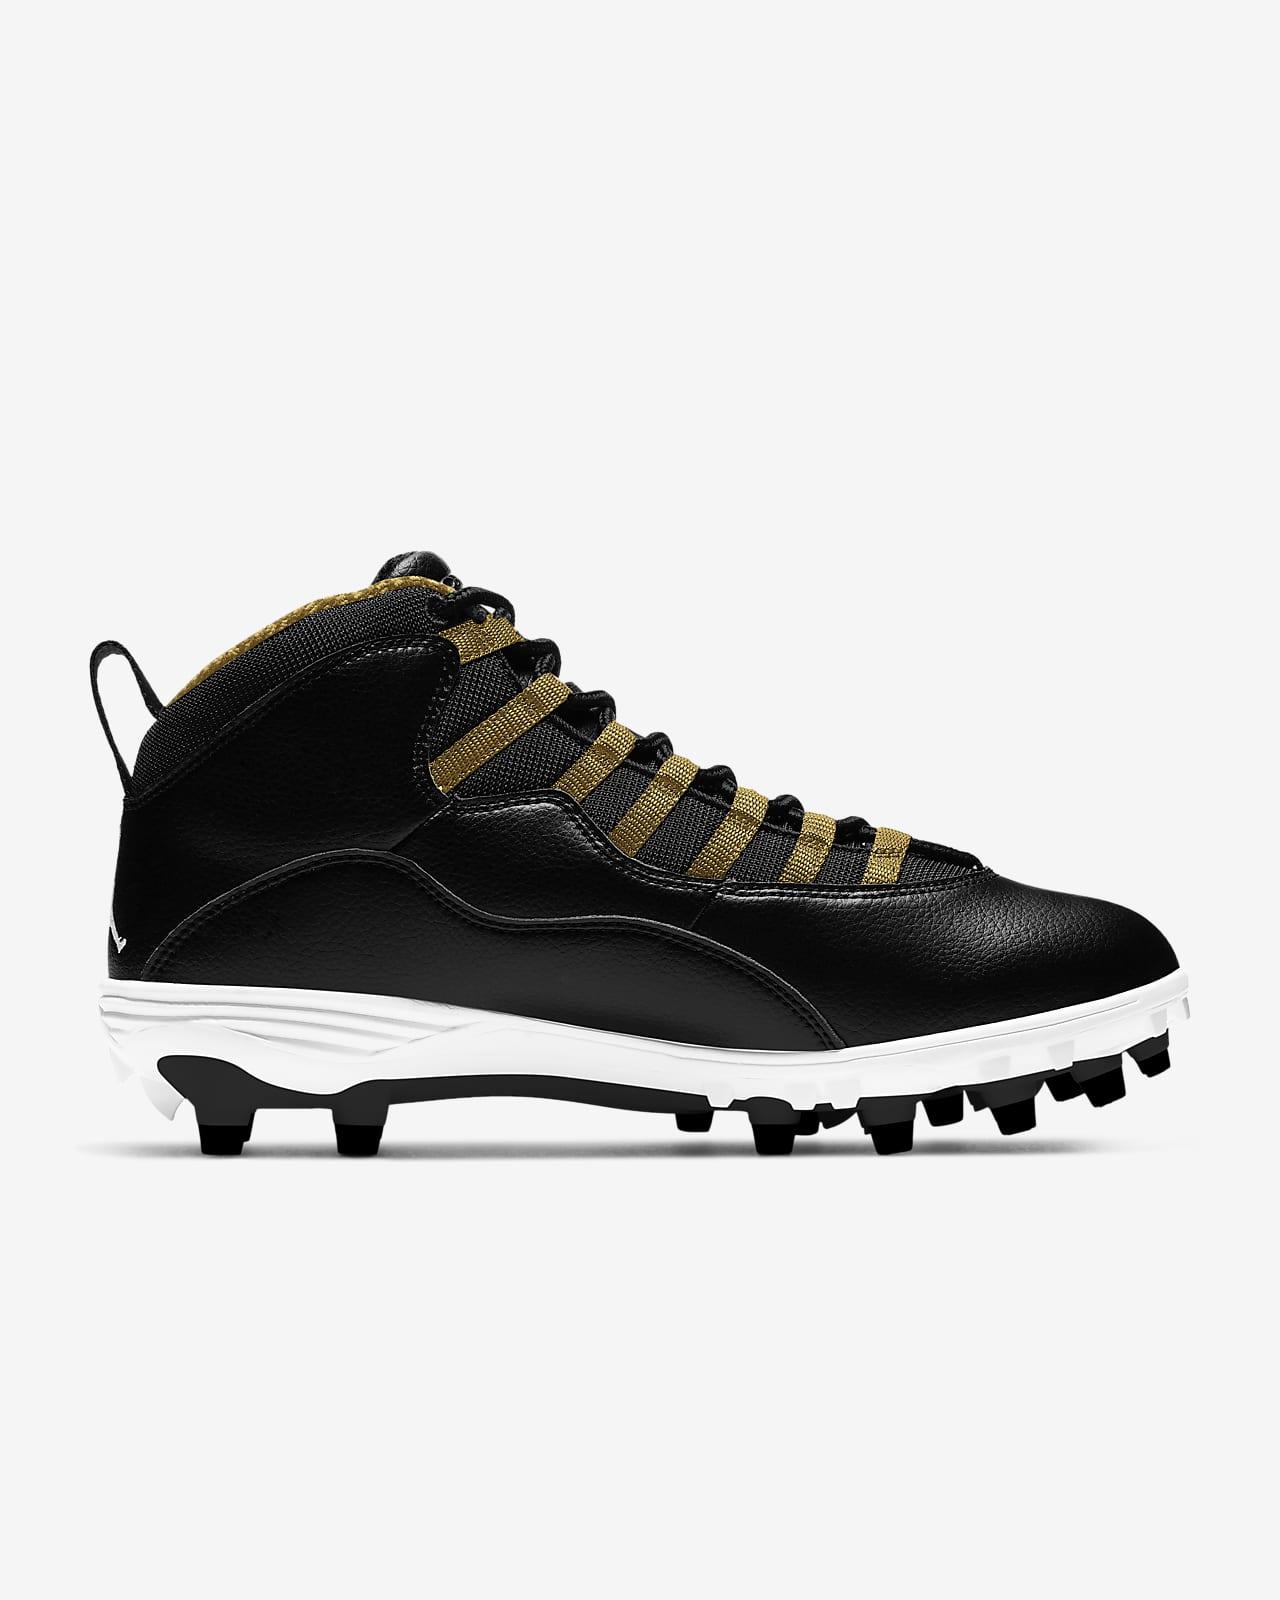 Jordan 10 Td Mid Men S Football Cleat Nike Com